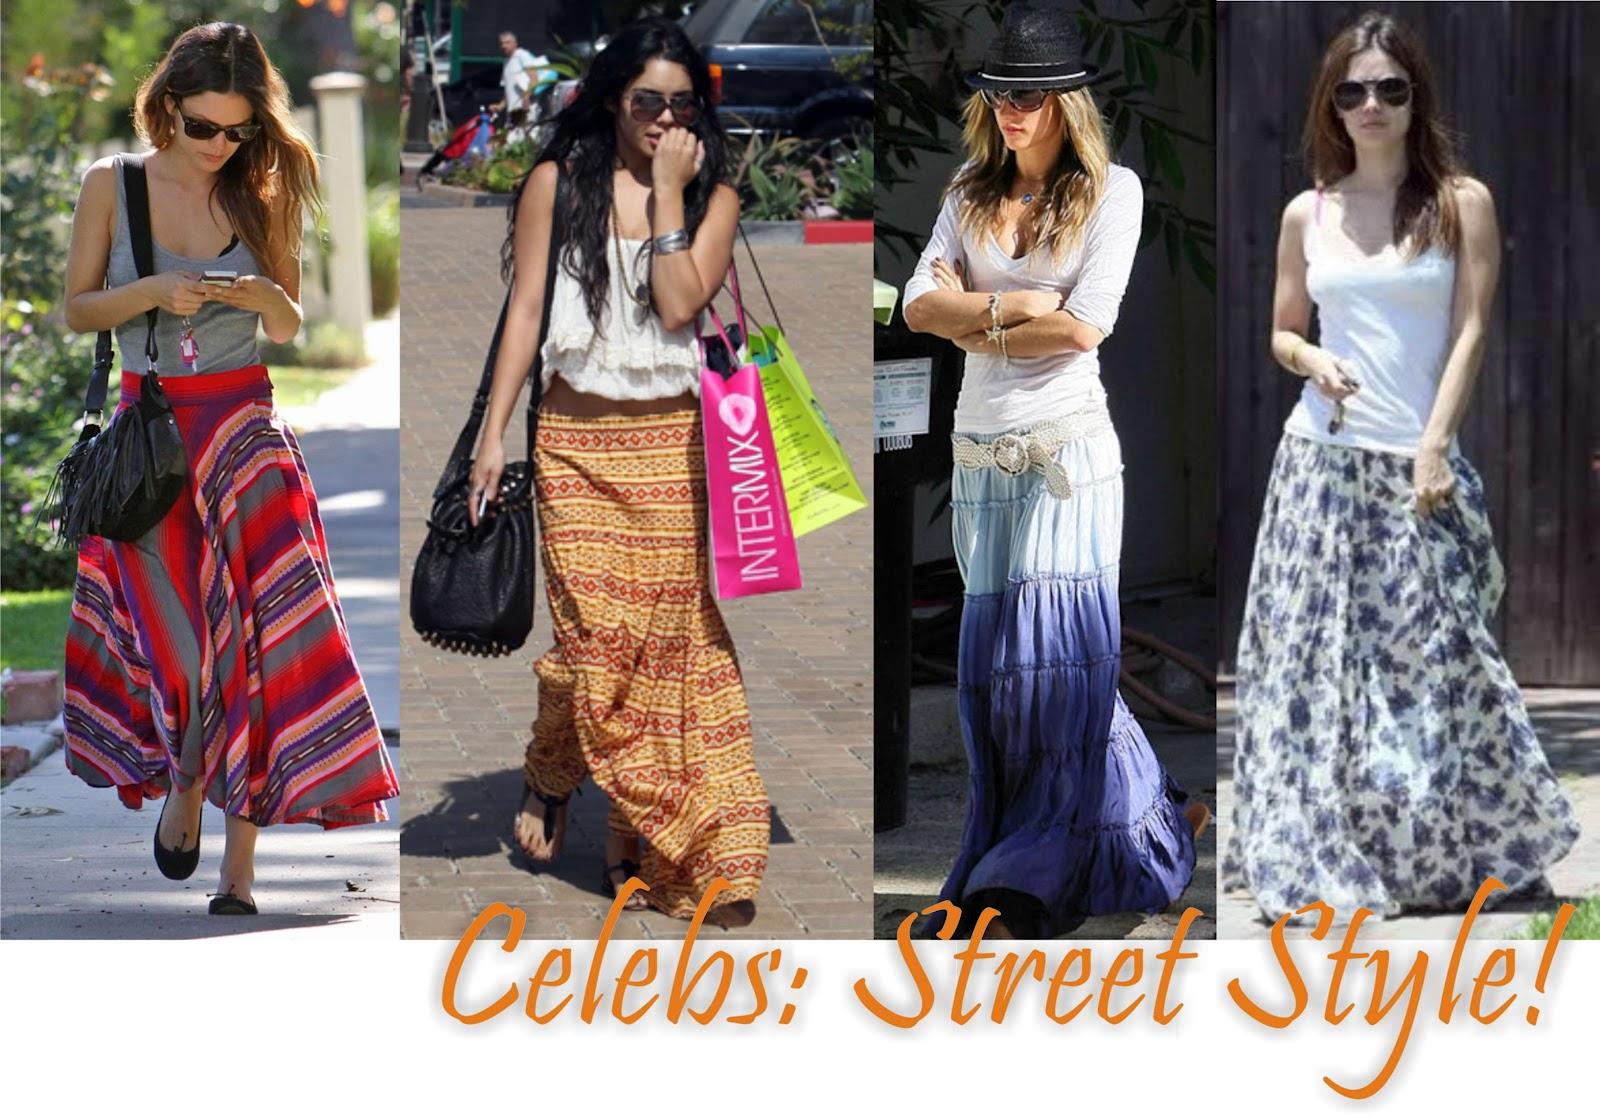 http://2.bp.blogspot.com/-dOOpfaa3ph4/T_9rt5uue0I/AAAAAAAACx4/fxdCWyobaKE/s1600/Trend+Alert+-+Maxi+Skirt++celebs+street+style+2.jpg